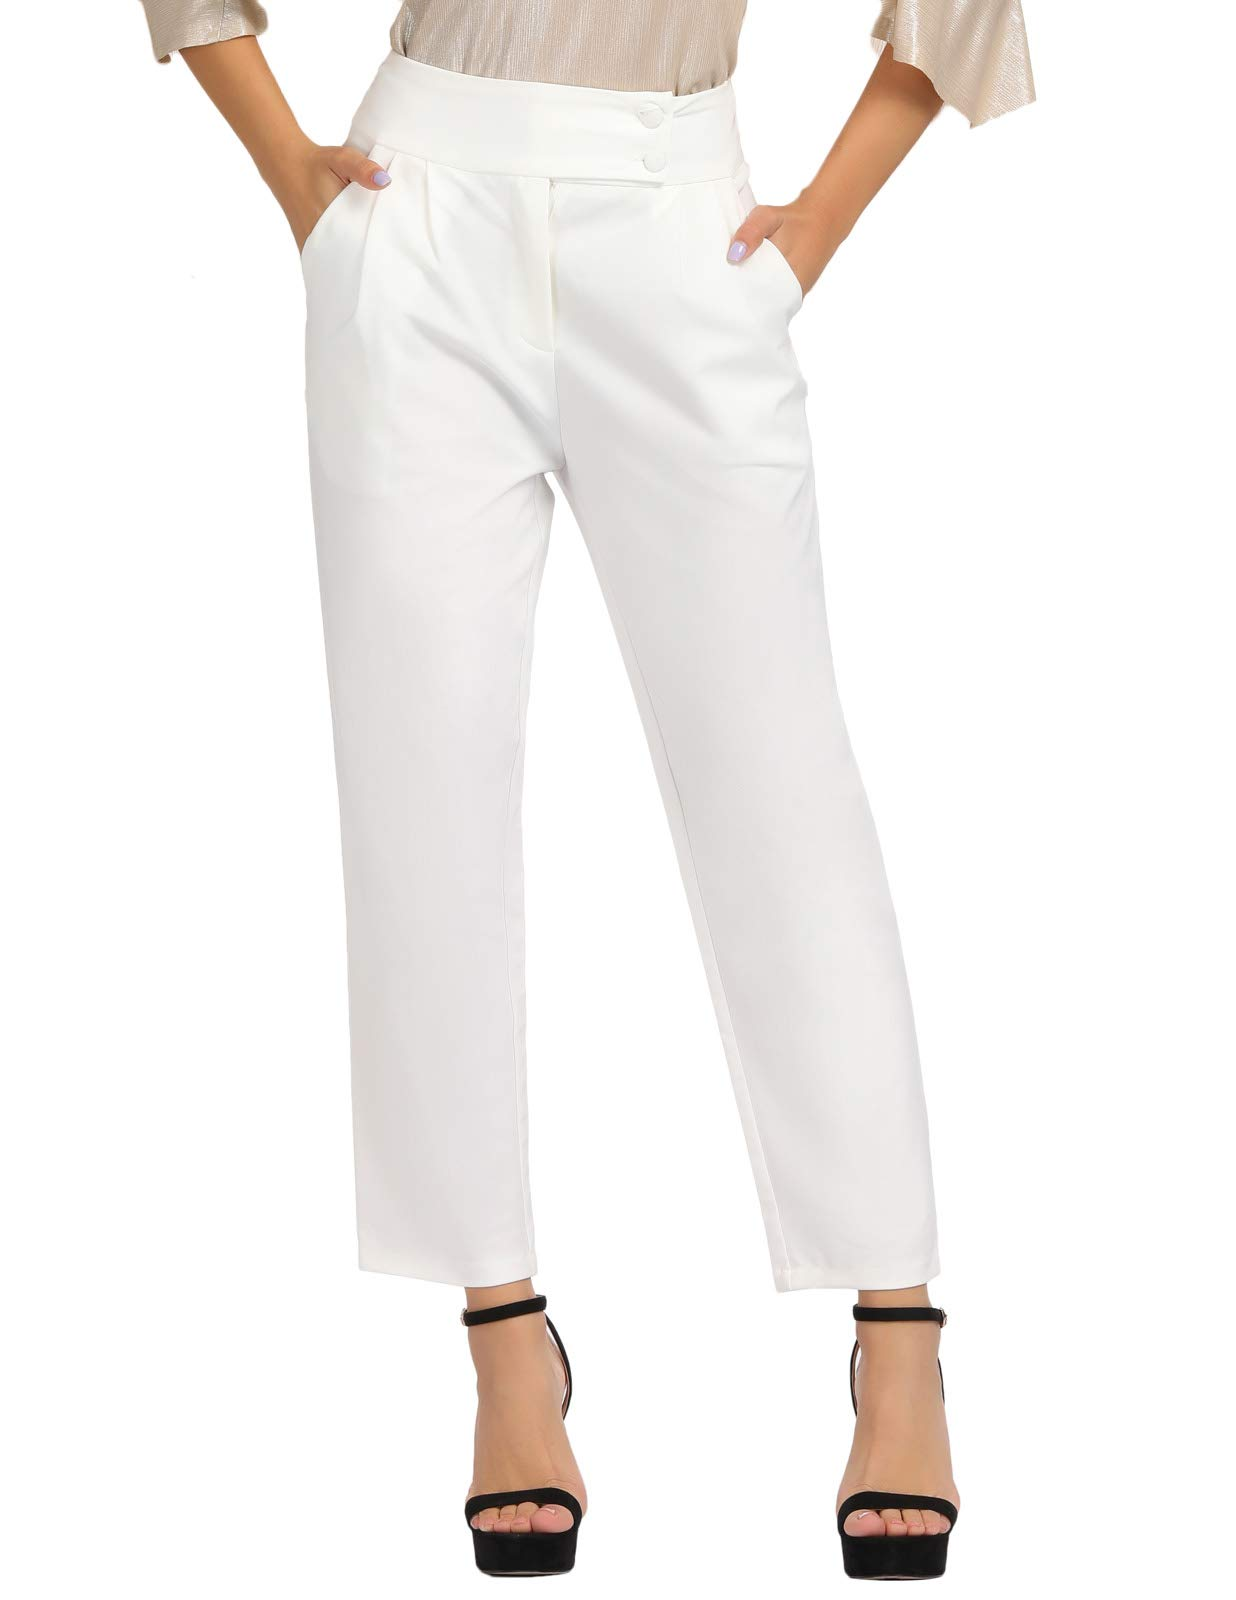 ویکالا · خرید  اصل اورجینال · خرید از آمازون · GRACE KARIN Womens Stretch Pull On Dress Pants Ankle Length Work Casual White L wekala · ویکالا